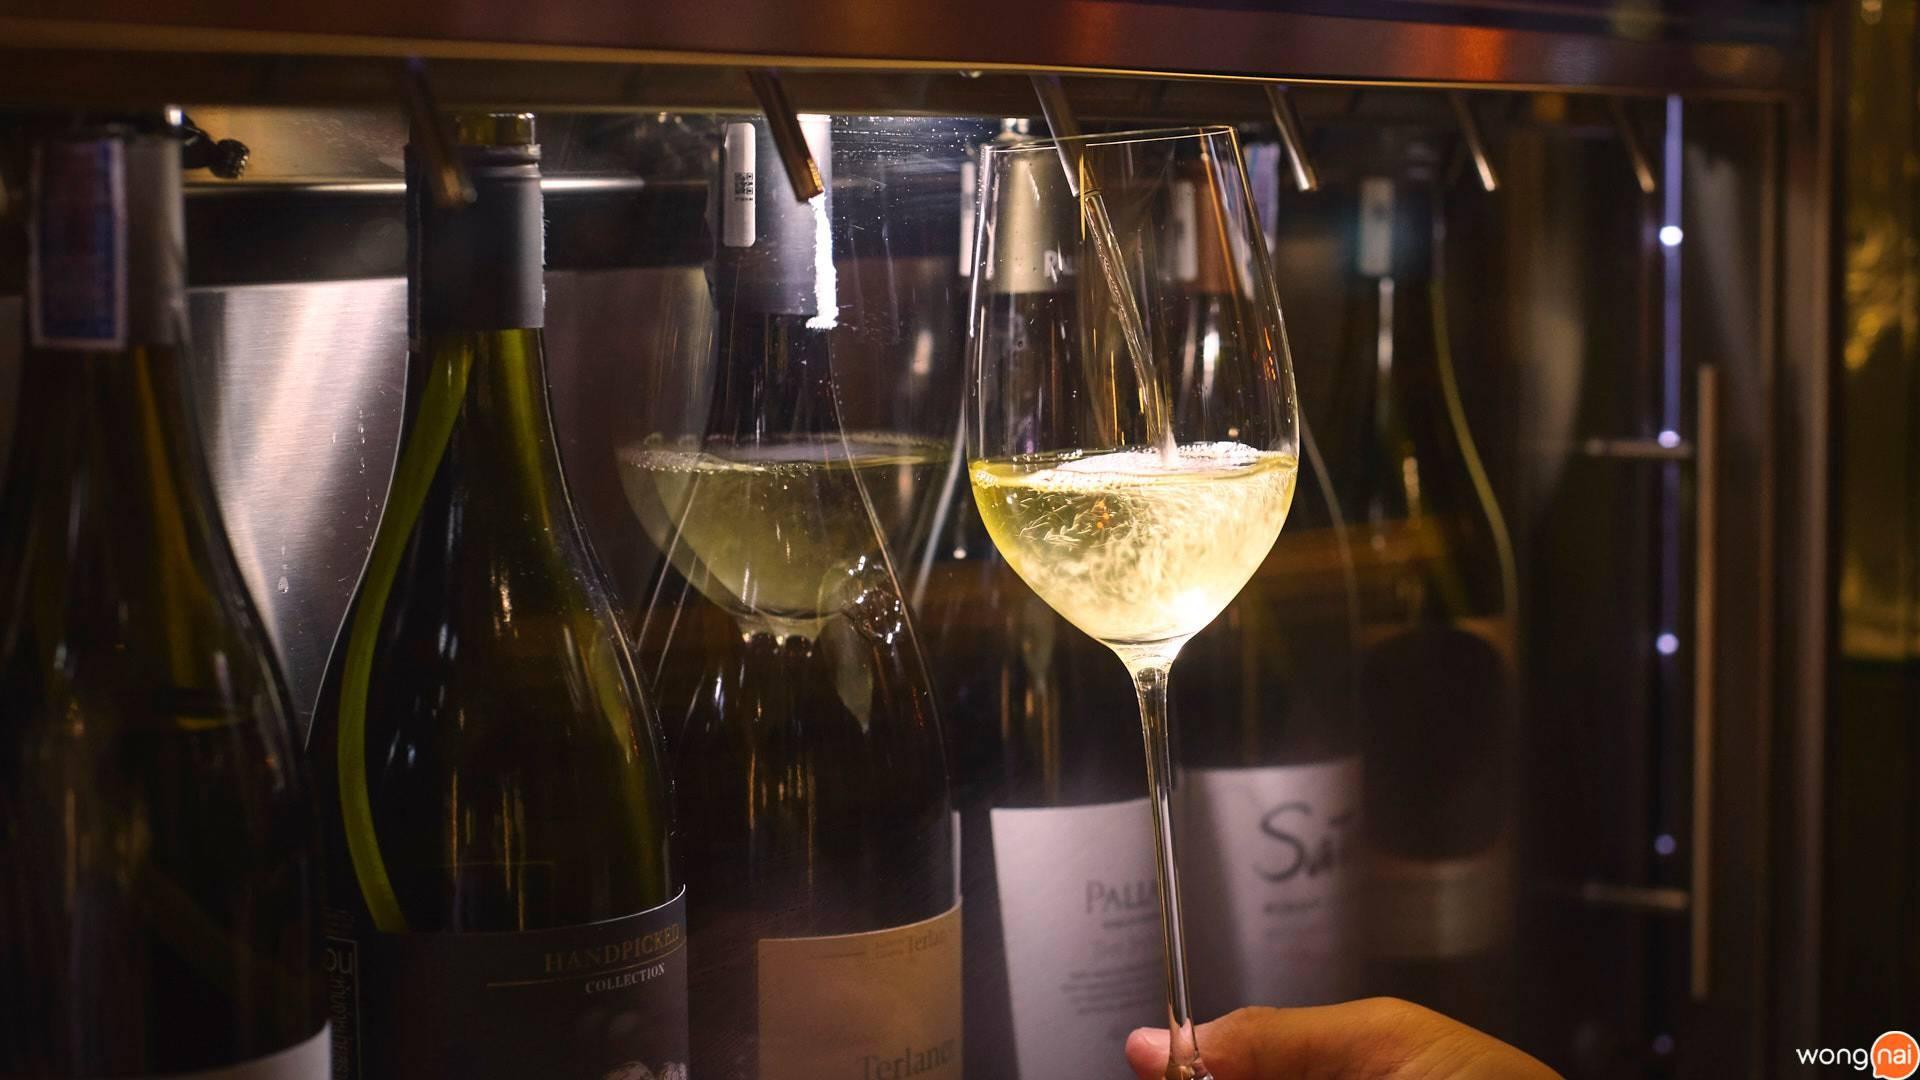 Riedel Wine Bar & Cellar (รีเดล ไวน์ บาร์ แอนด์ เซลล่าร์) Gaysorn Village